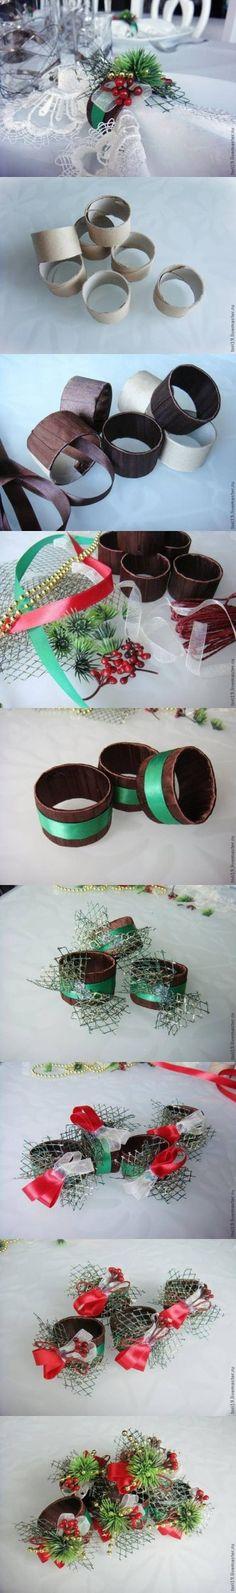 DIY Toilet Roll Custom Napkin Rings DIY Projects